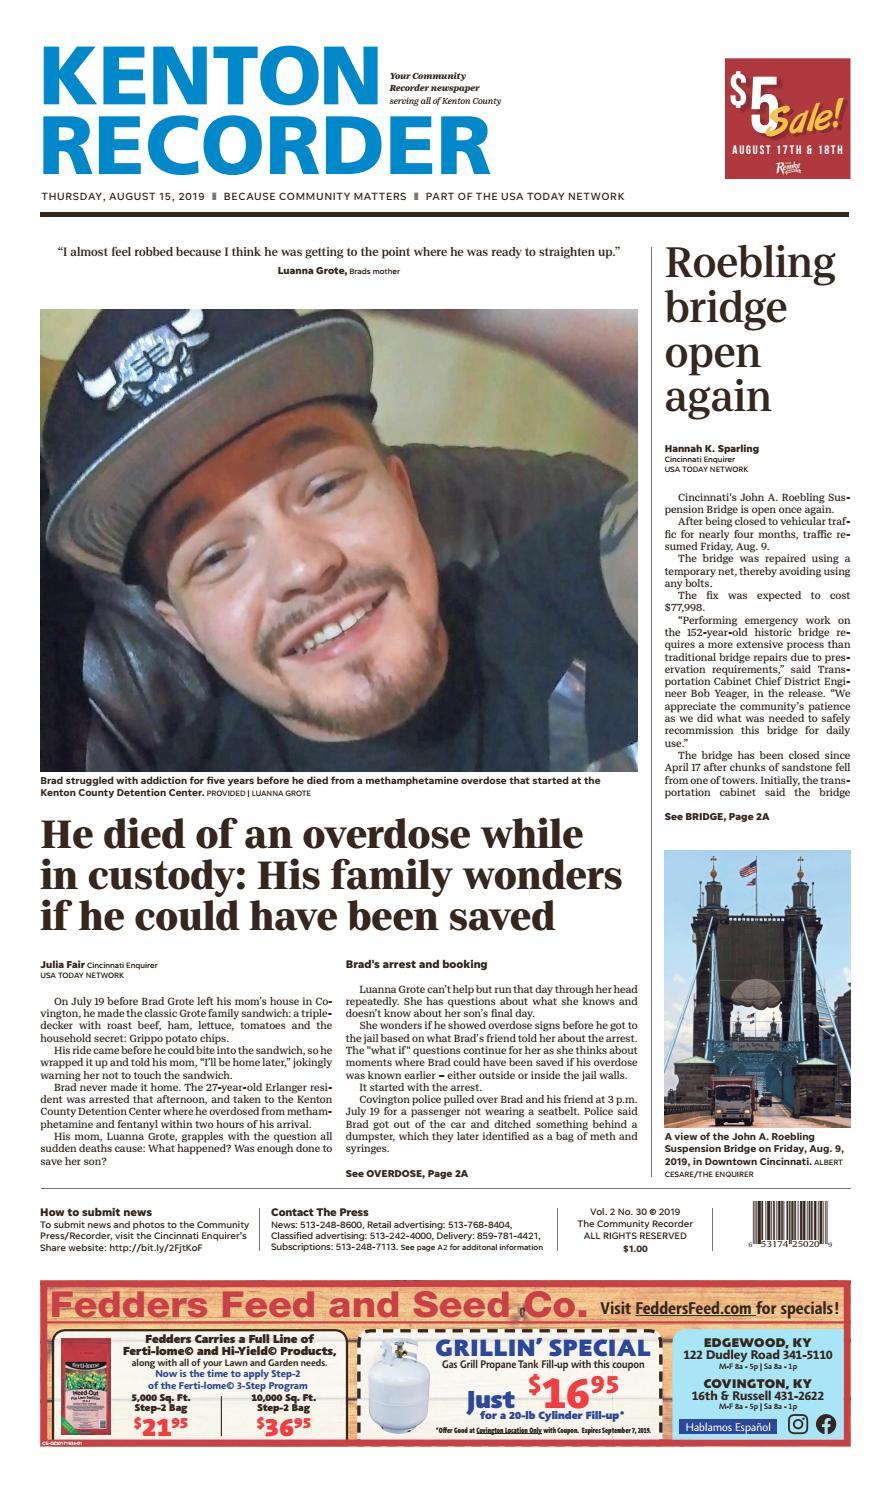 Kenton Recorder 08/15/19 by Enquirer Media - issuu